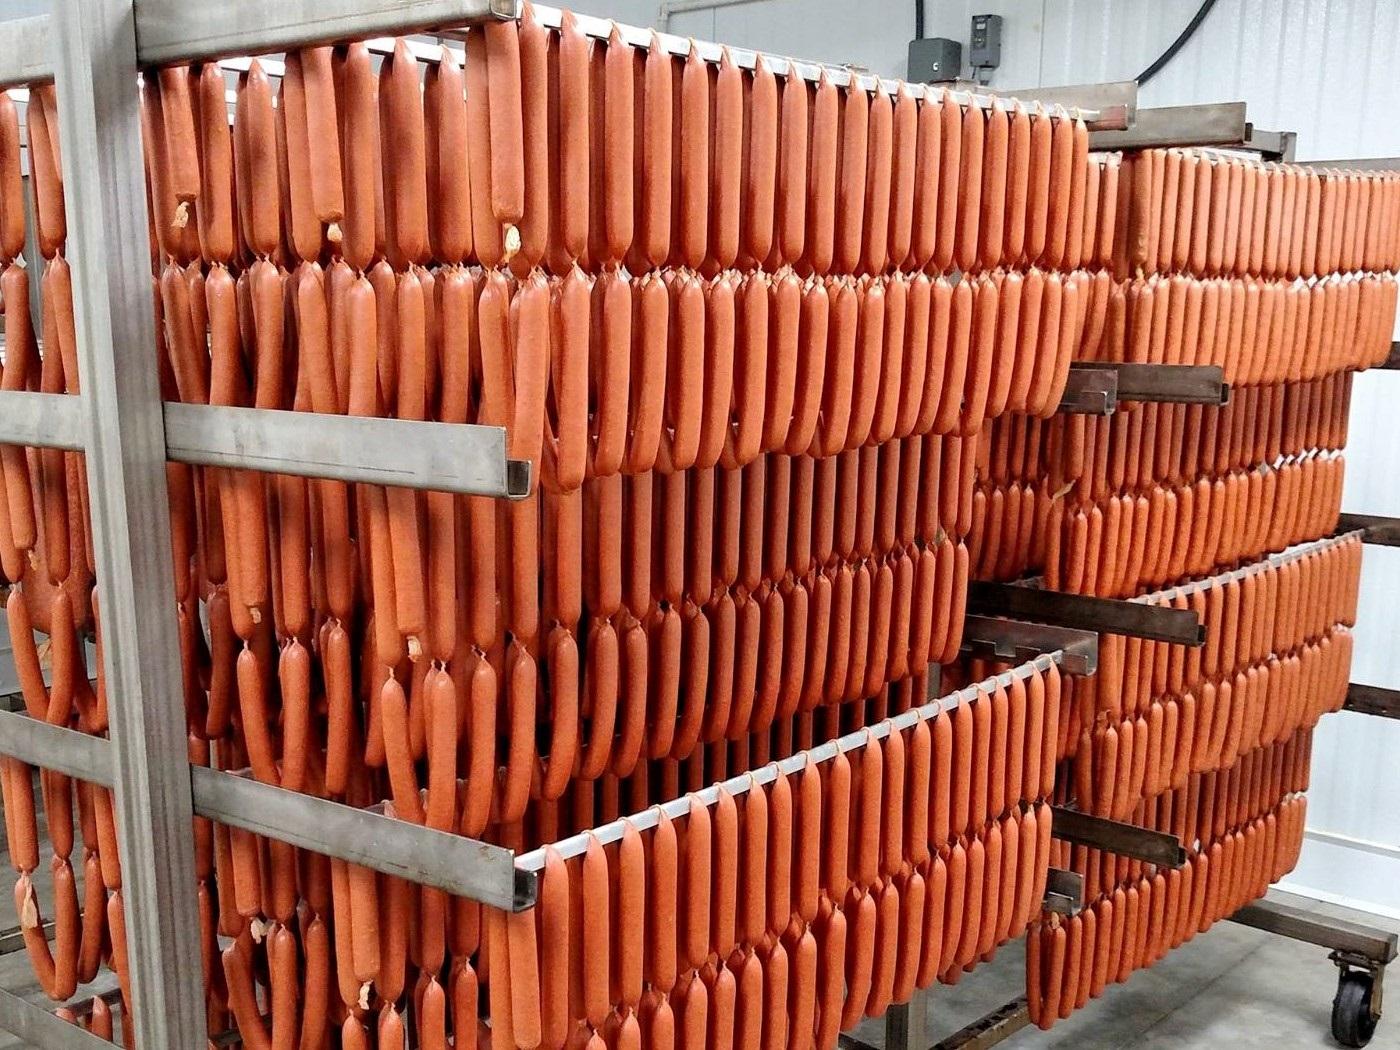 hotdogs2.jpg